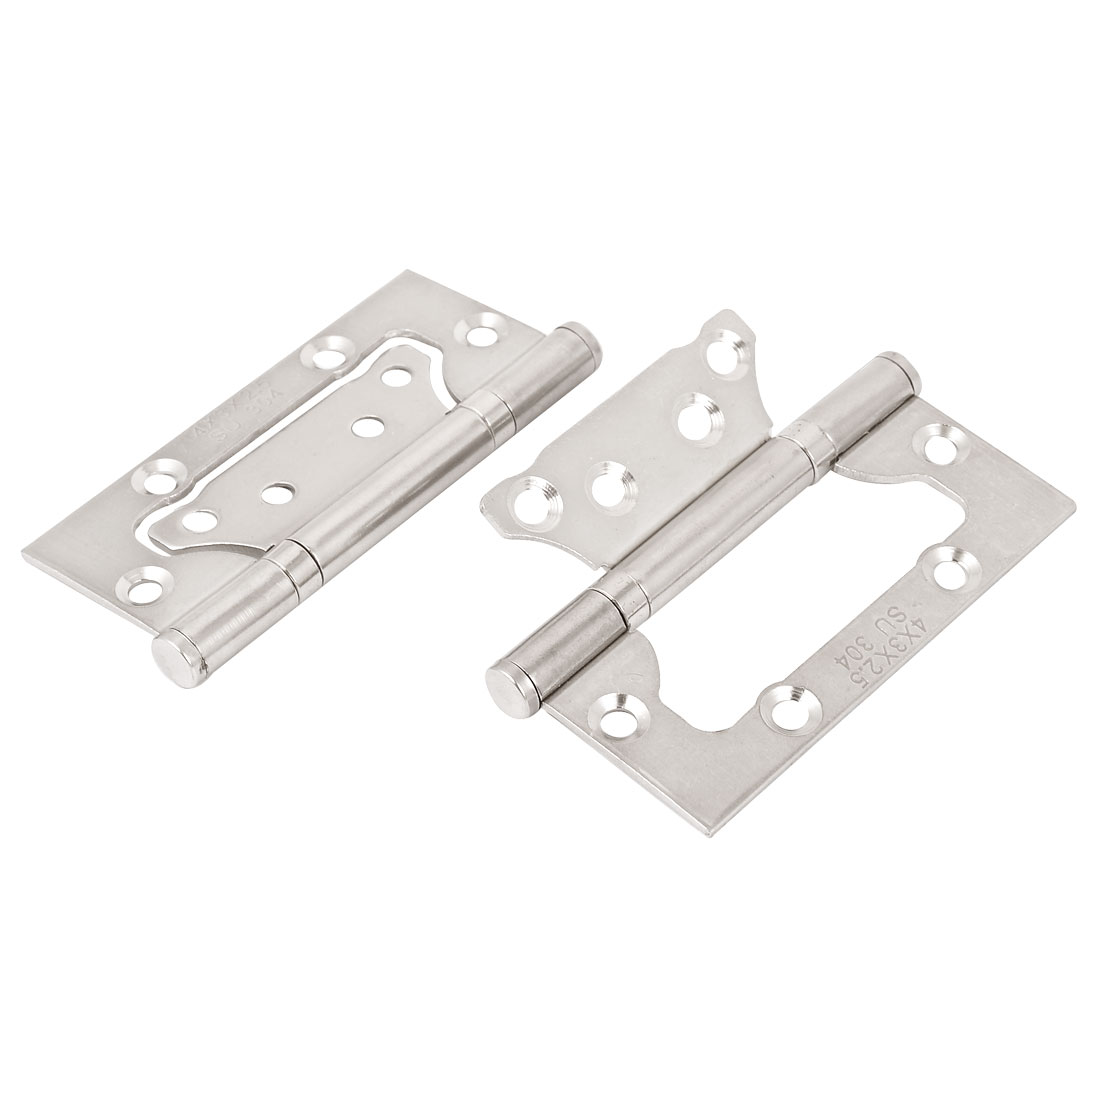 "Furniture Windows Cabinet 4"" Long Metal Door Butt Hinges Hardware Silver Tone 2pcs"